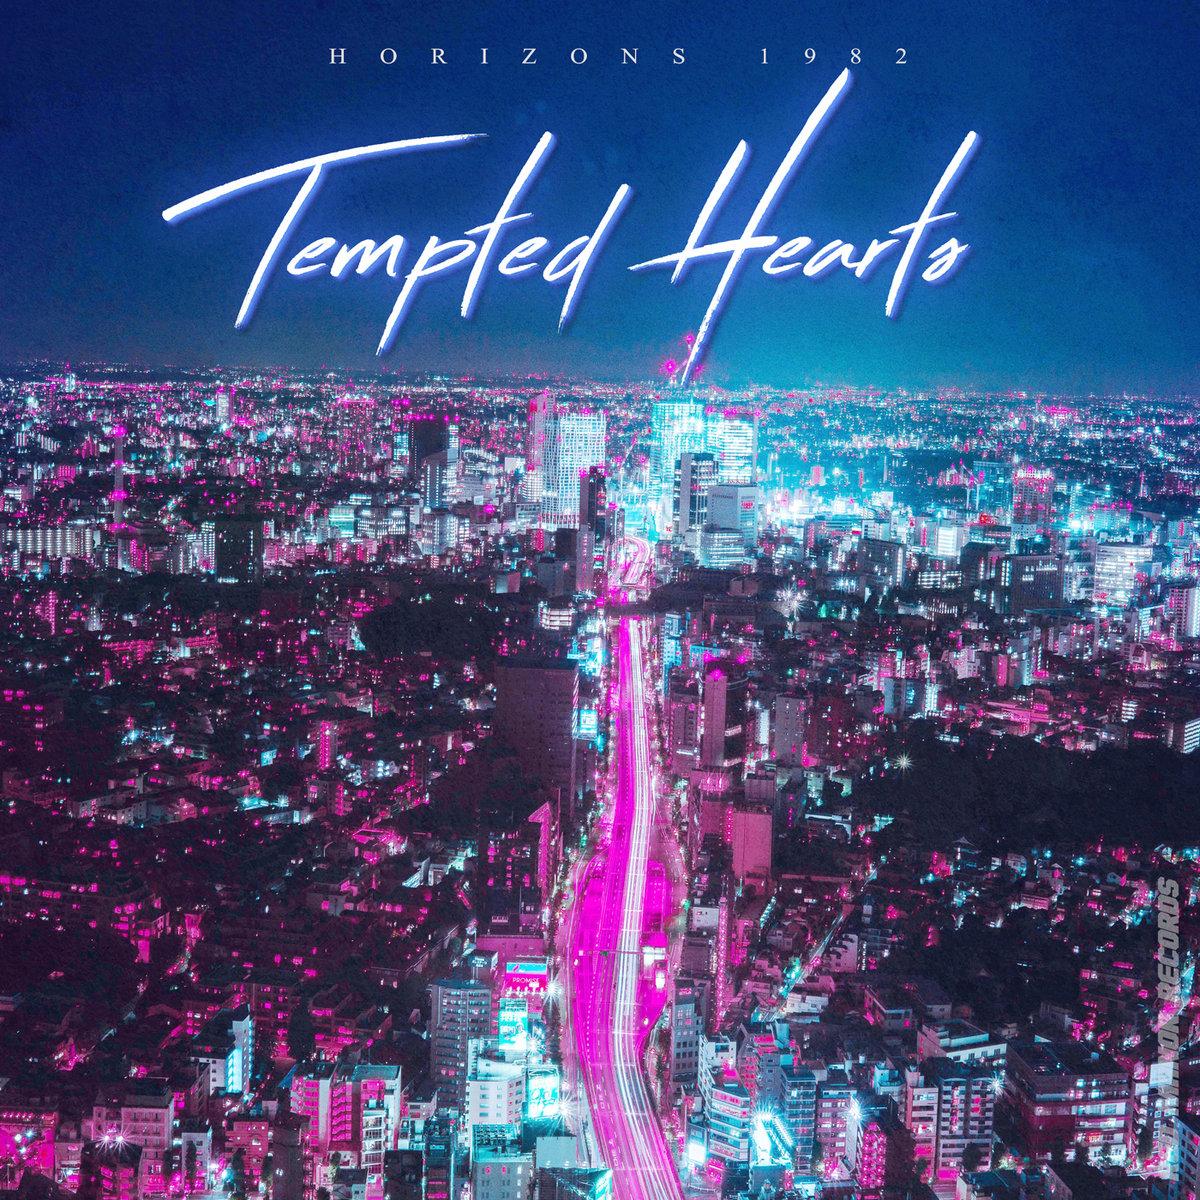 Horizons 1982 Tempted Hearts - Horizons 1982 - Tempted Hearts